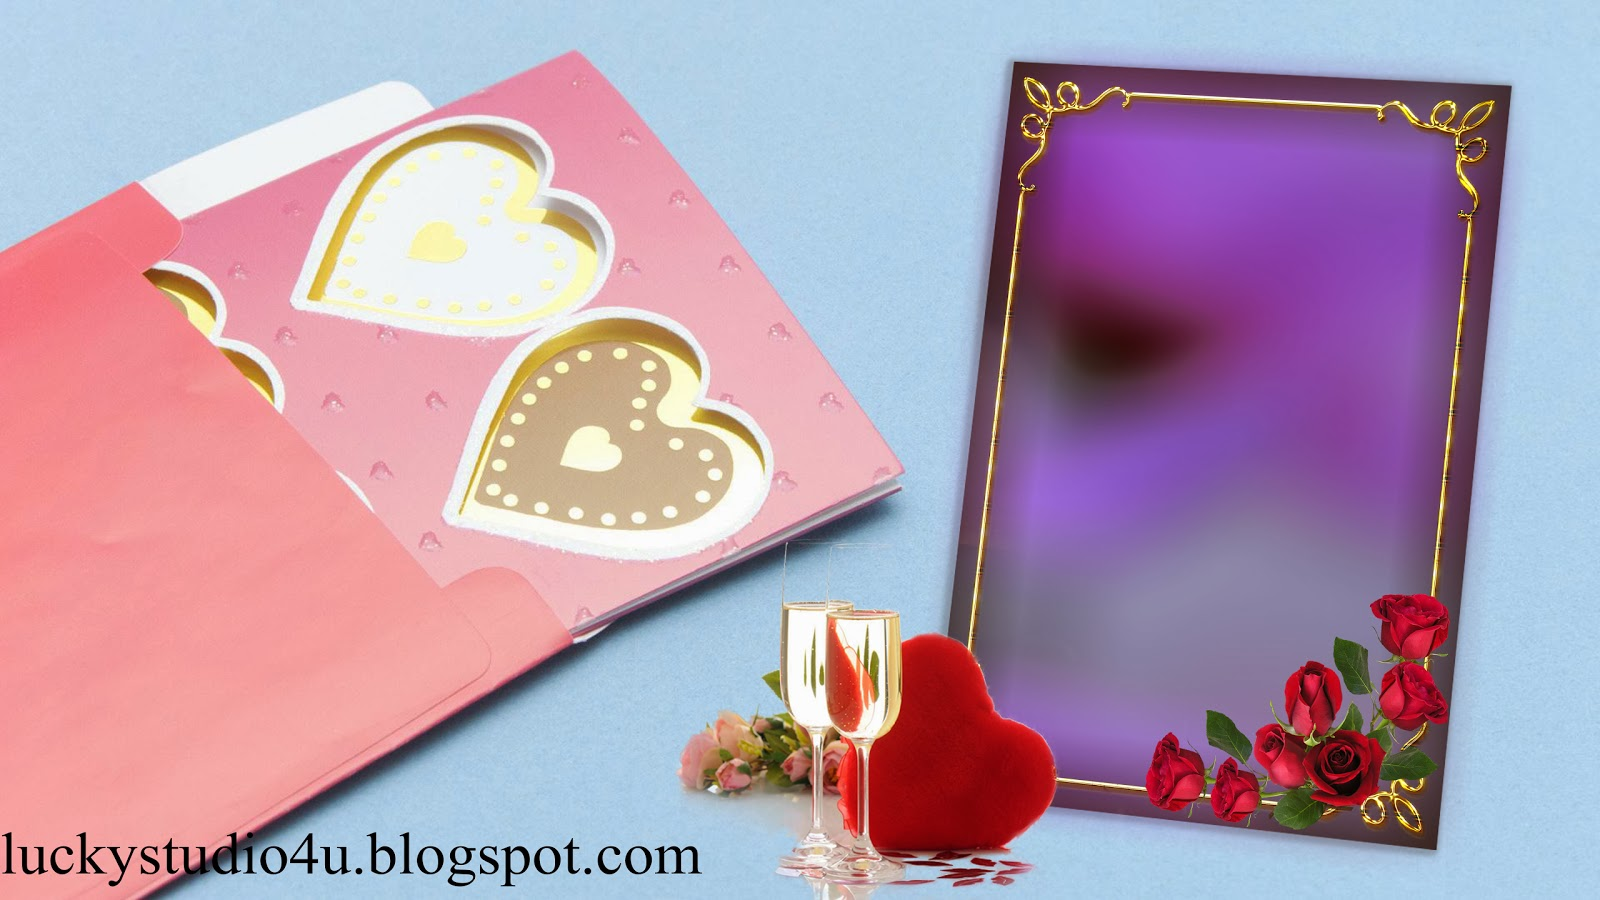 16 Digital Wedding Album Psd Files Images Wedding Album Design